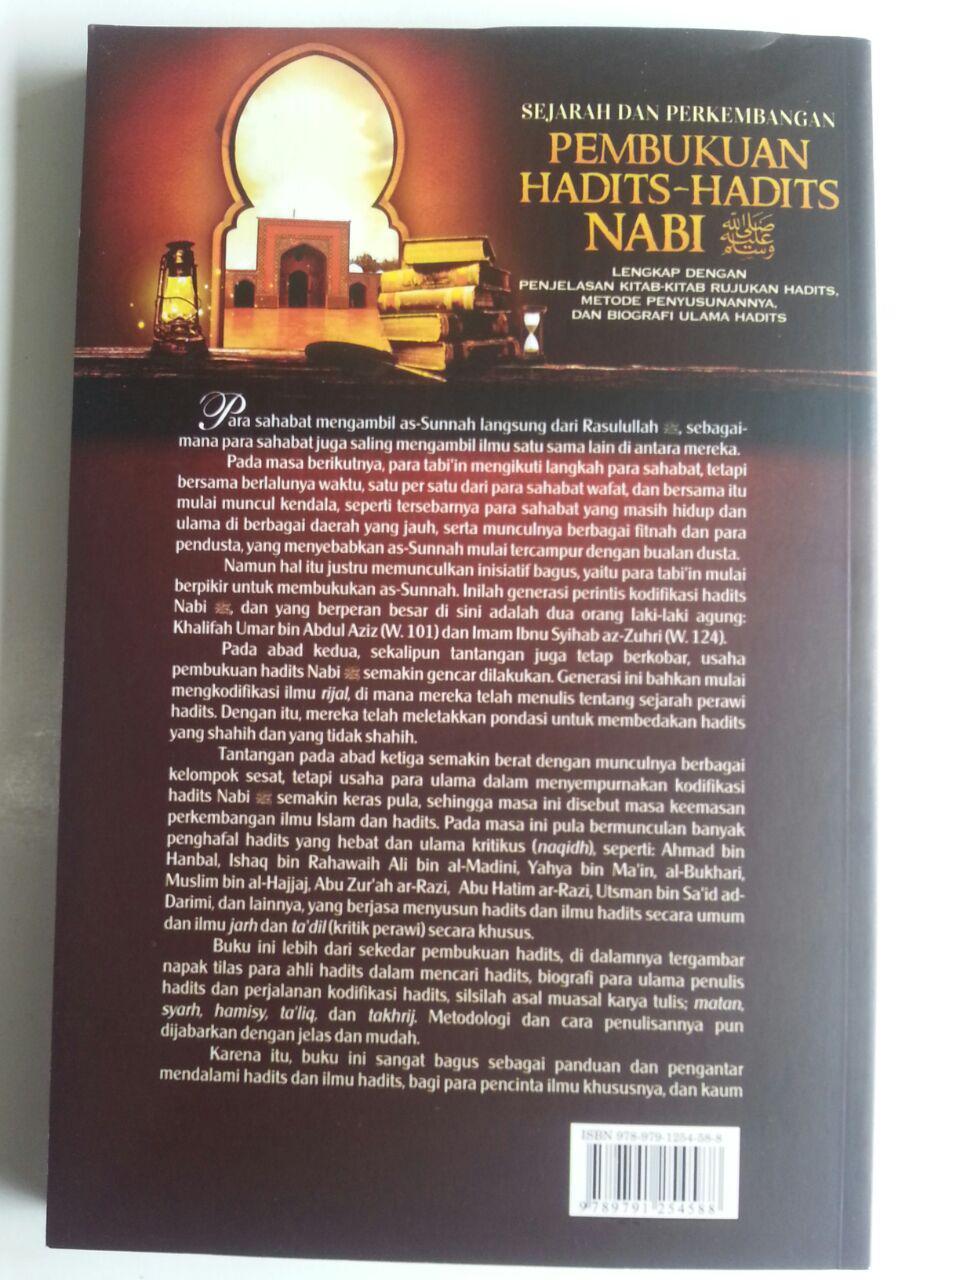 Buku Sejarah Dan Perkembangan Pembukuan Hadits-Hadits Nabi cover